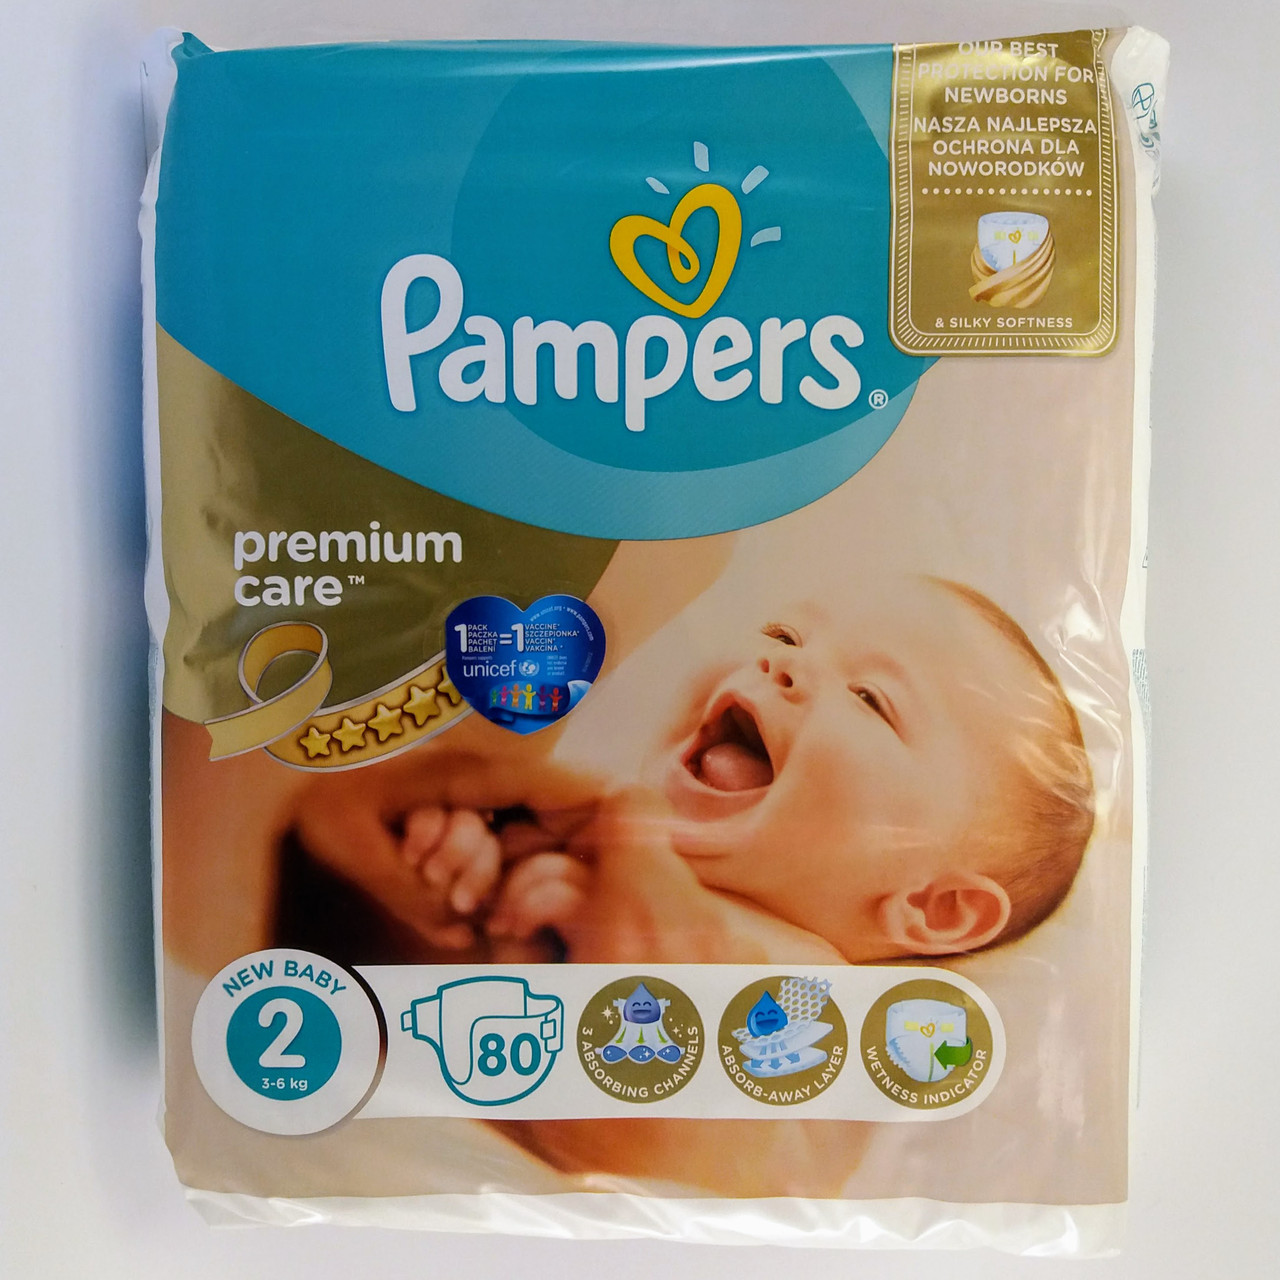 Подгузник Pampers premium care Newborn 2, 3-6 кг 80шт